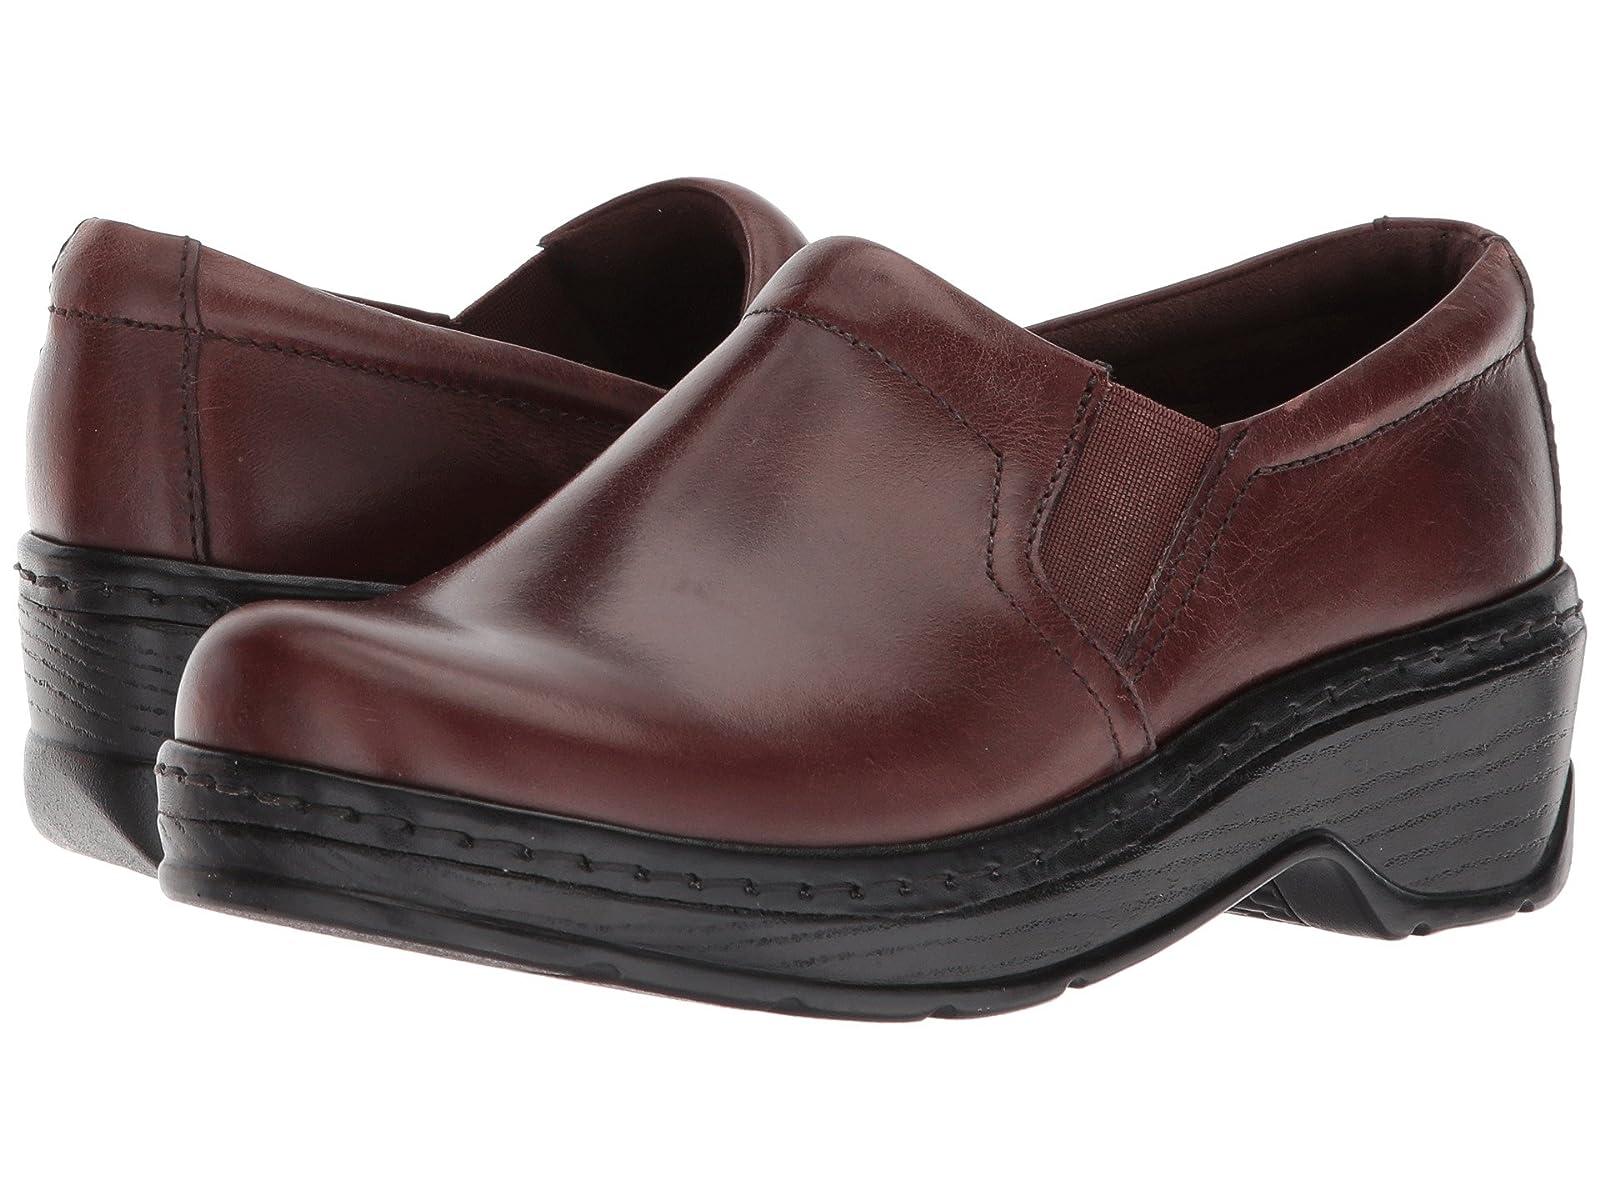 Klogs Footwear NaplesAtmospheric grades have affordable shoes